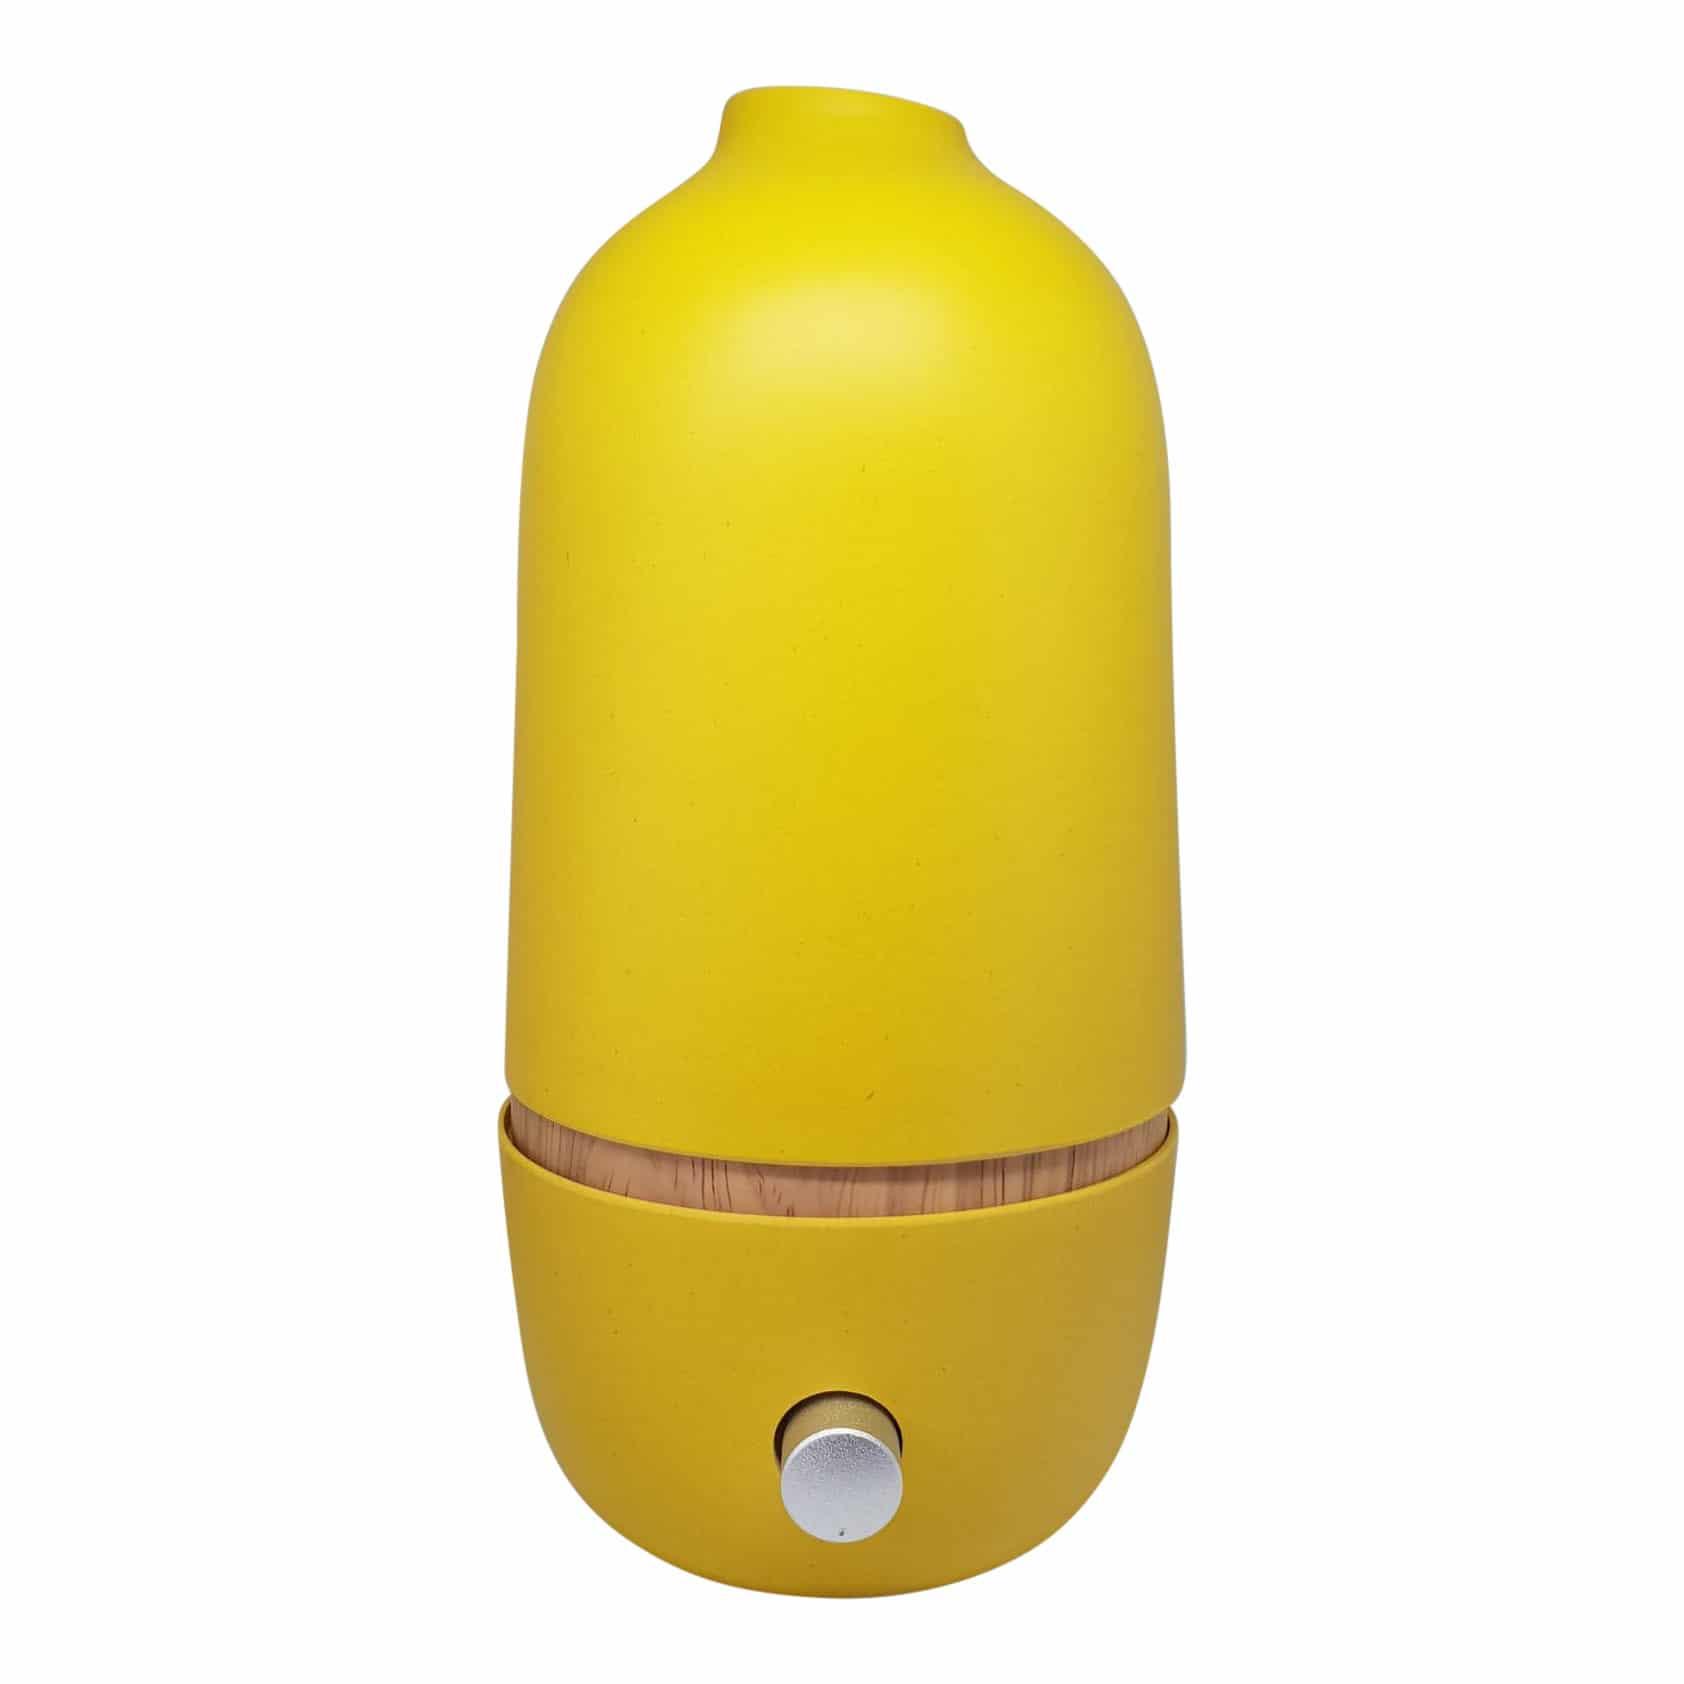 BO Lemon Aroma Diffuser